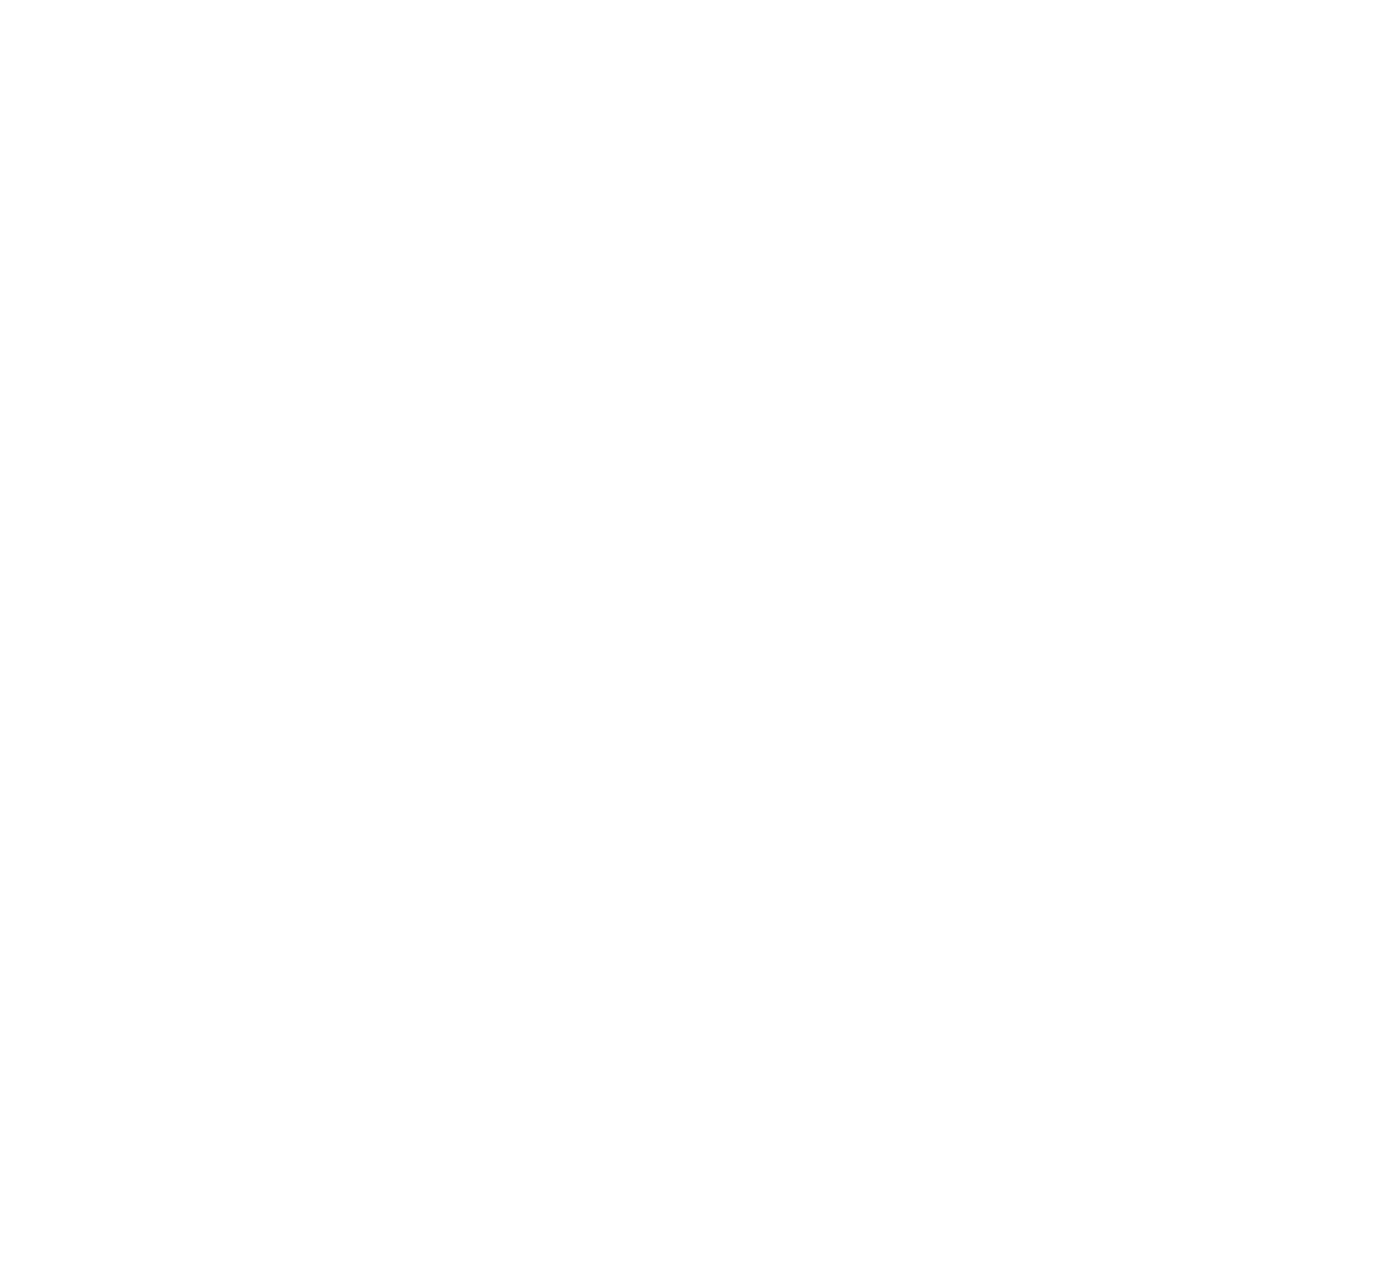 Hochzeitsfotograf Delmenhorst - Lars Holscher Fotografie